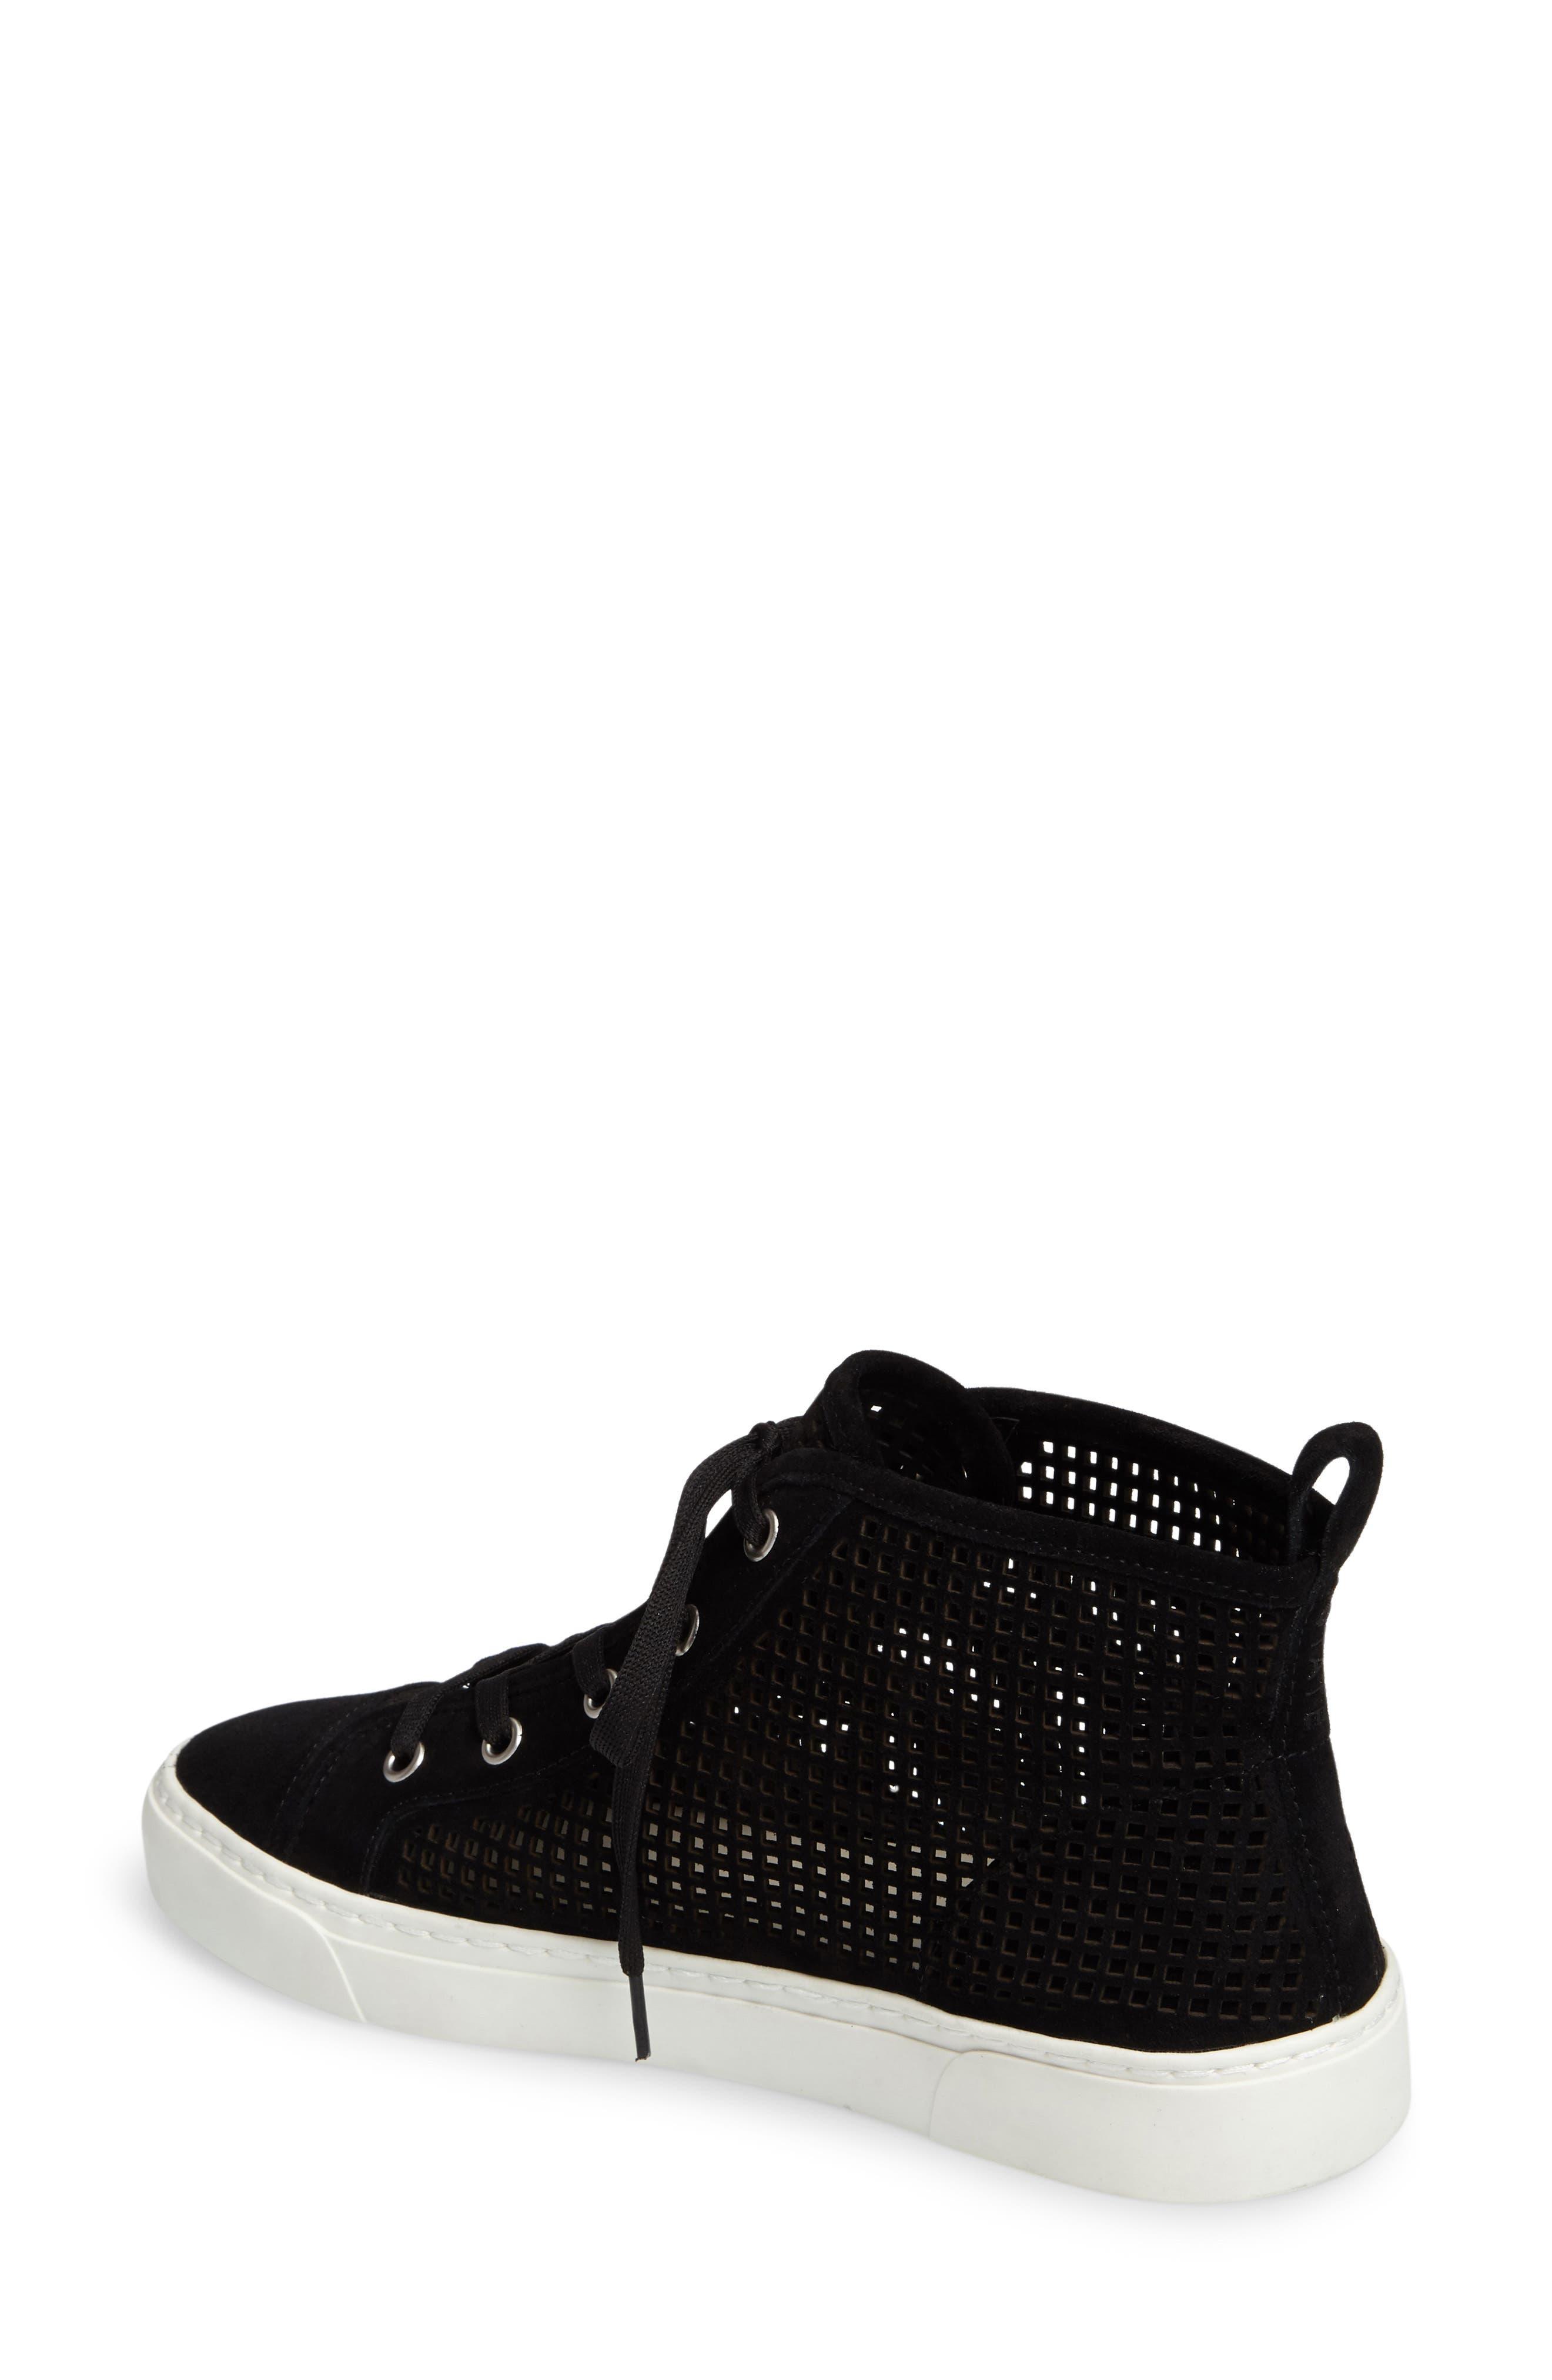 Dulcia Perforated High-Top Sneaker,                             Alternate thumbnail 2, color,                             001